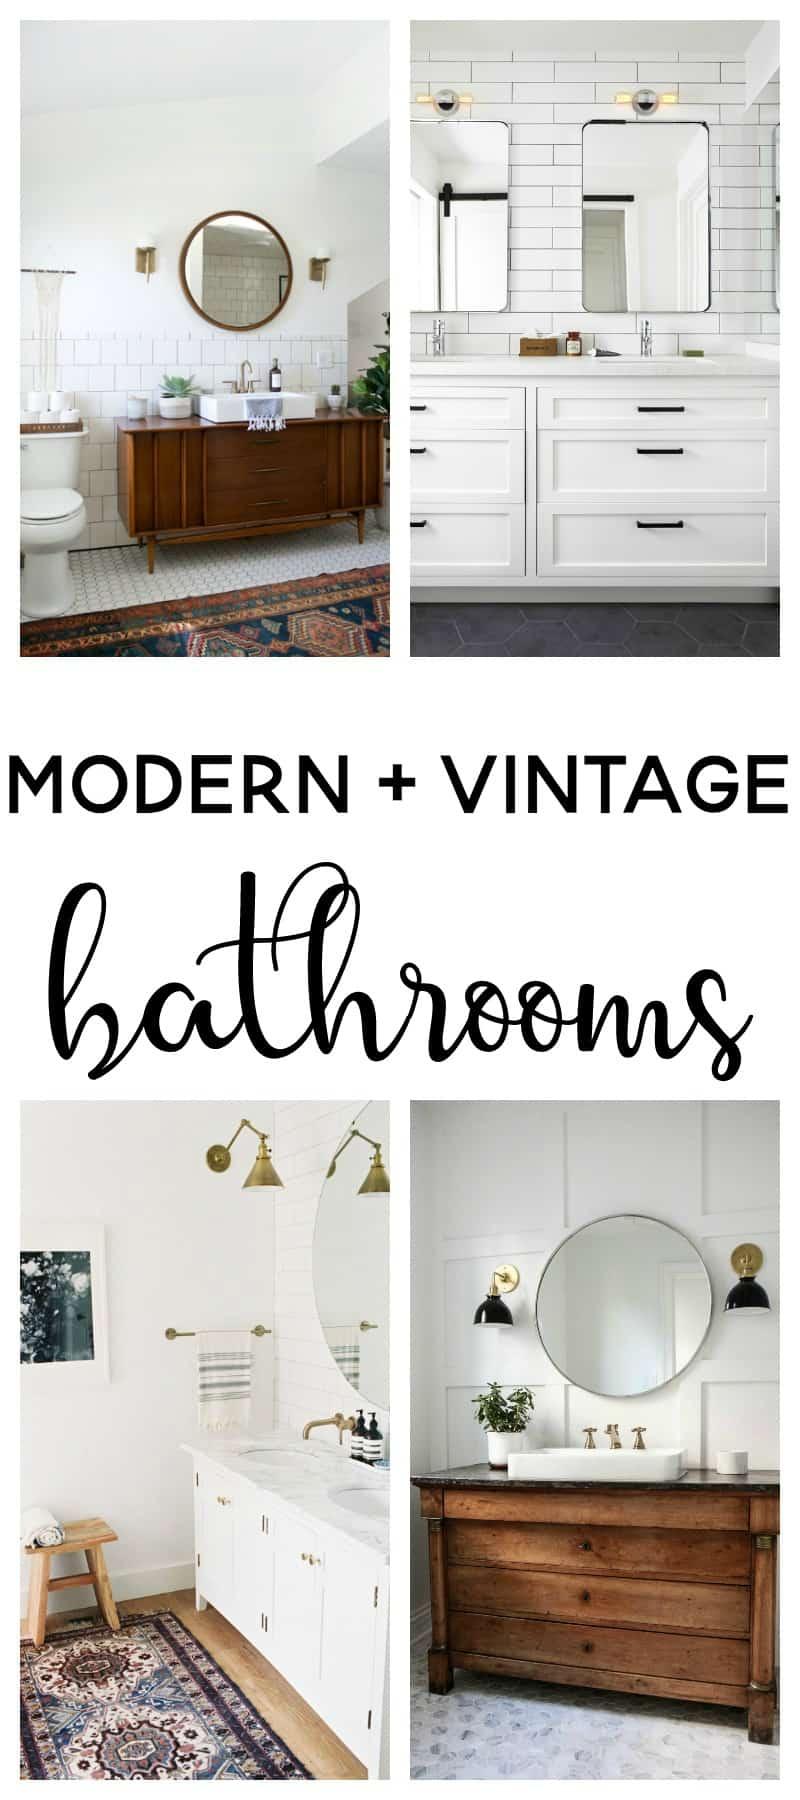 modern vintage bathroom | modern farmhouse | modern vintage bathroom ideas | bathroom ideas | bathroom remodel | bathroom decor | master bathroom ideas | master bathroom remodel | master bath remodel |